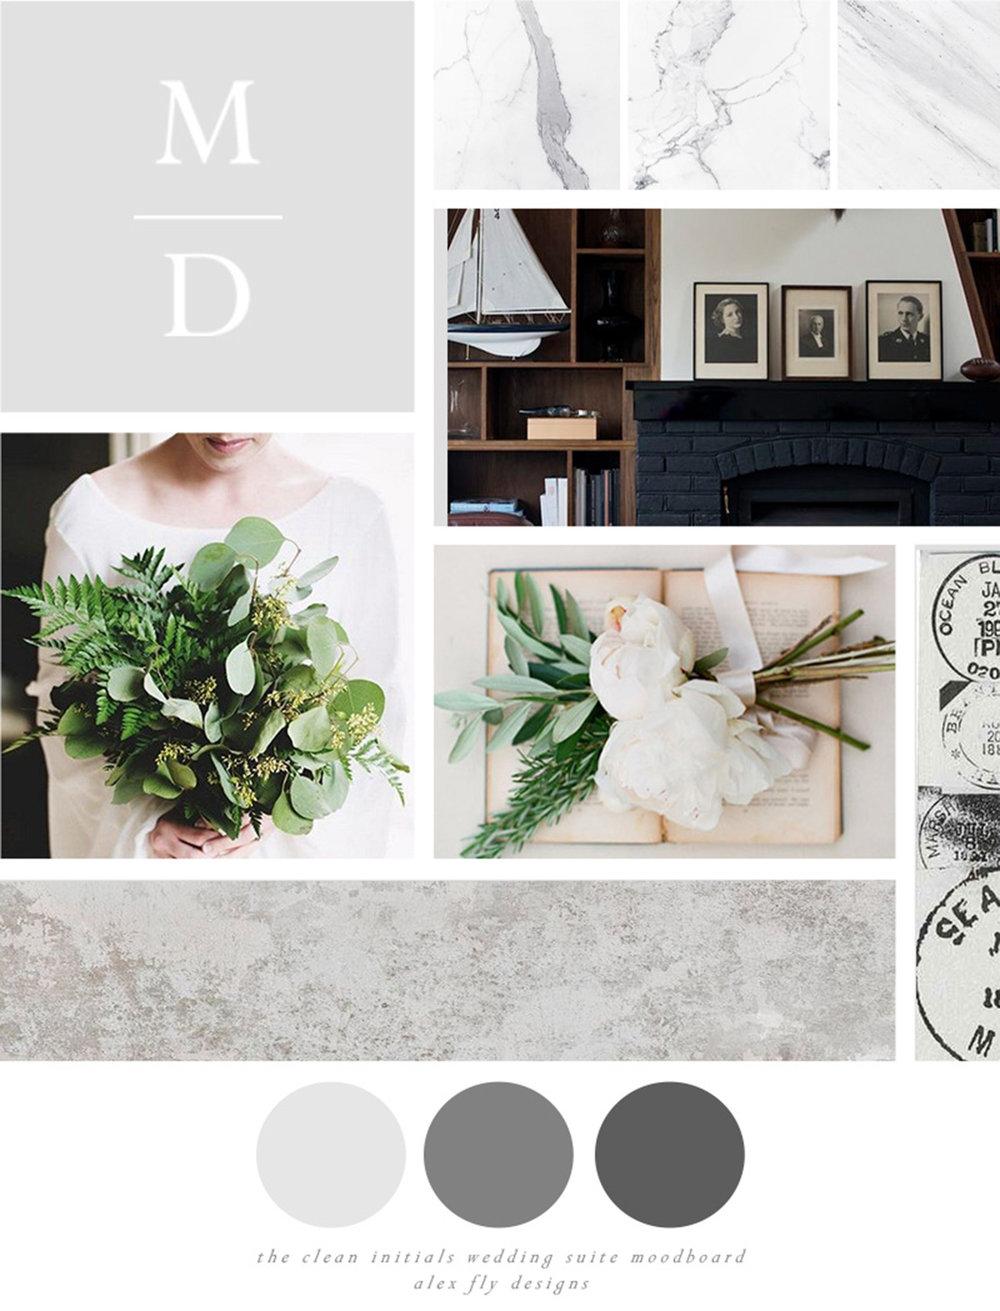 clean-initials-moodboard.jpg